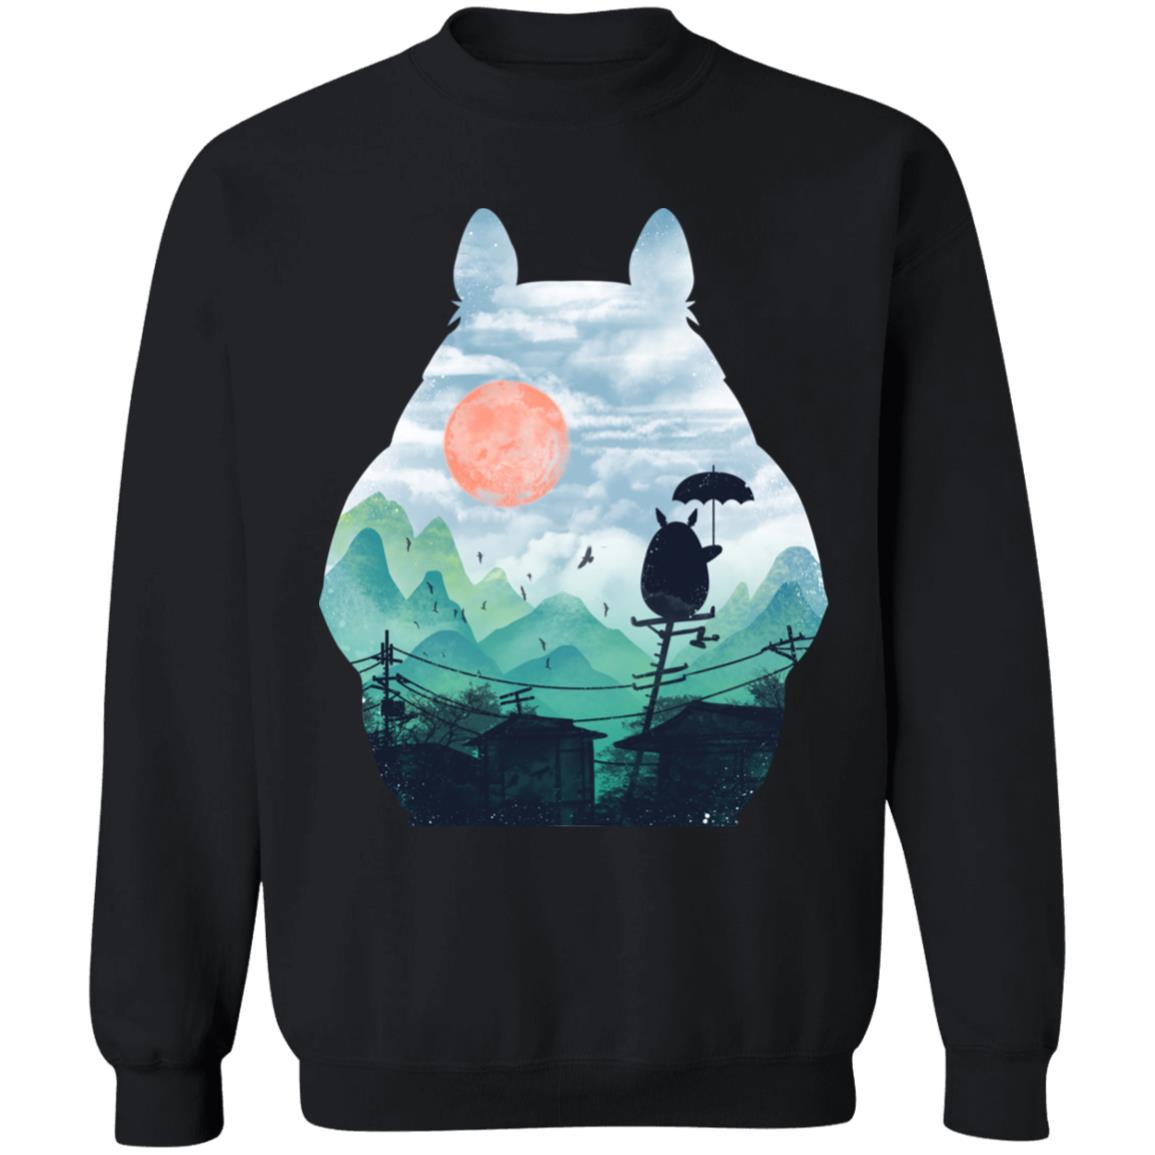 Totoro on the Line Lanscape Sweatshirt